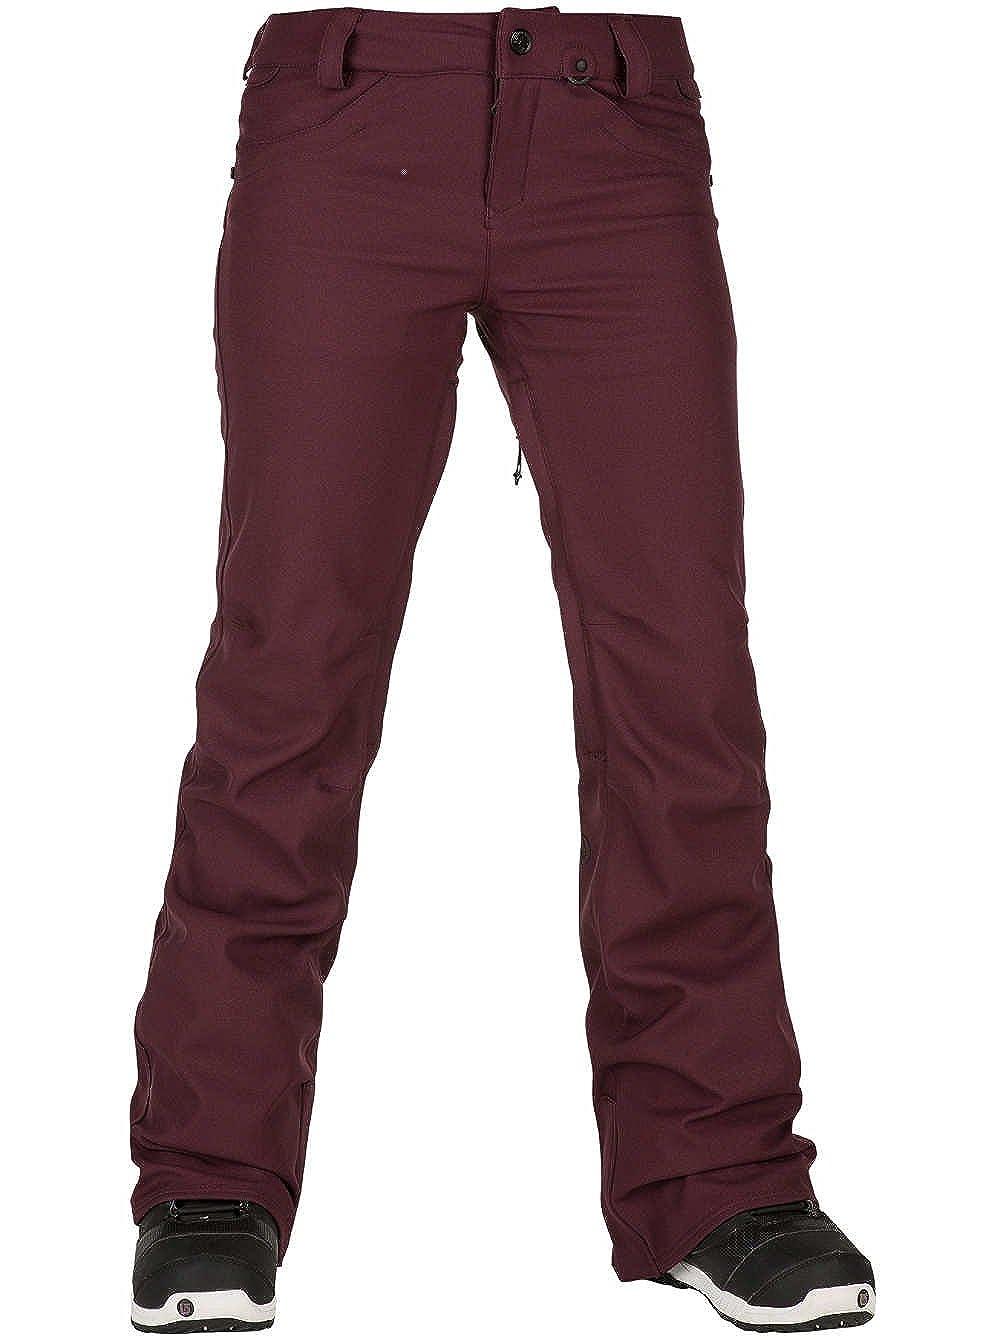 MERLOT XXS Volcom - Pantalon Femme De Ski Snow Species Stretch Copper - Femme - Marron